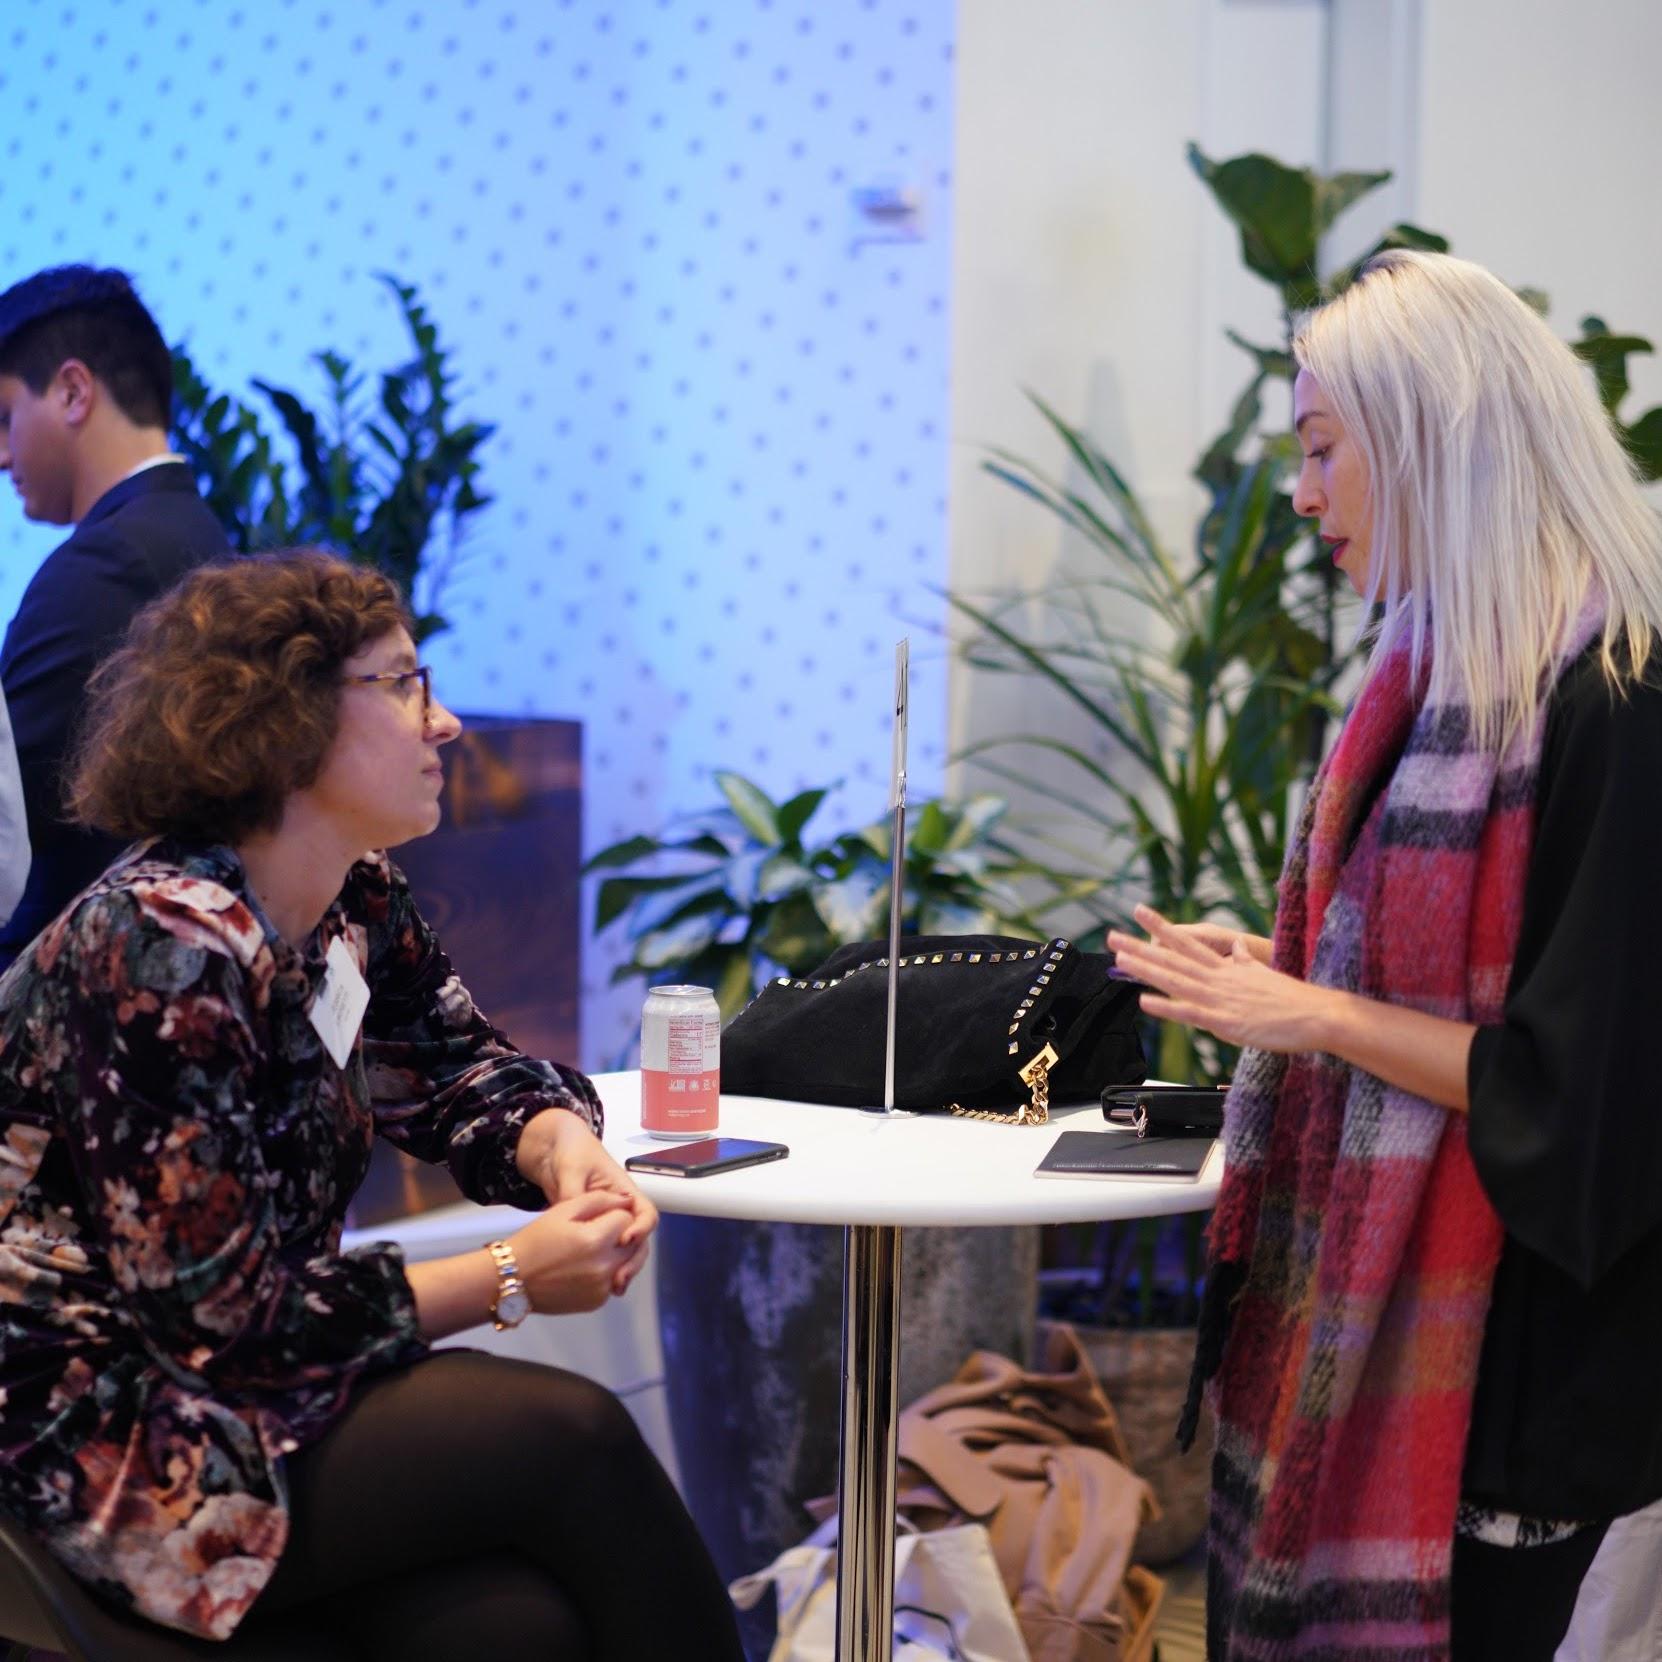 Women, discussing employment opportunities.